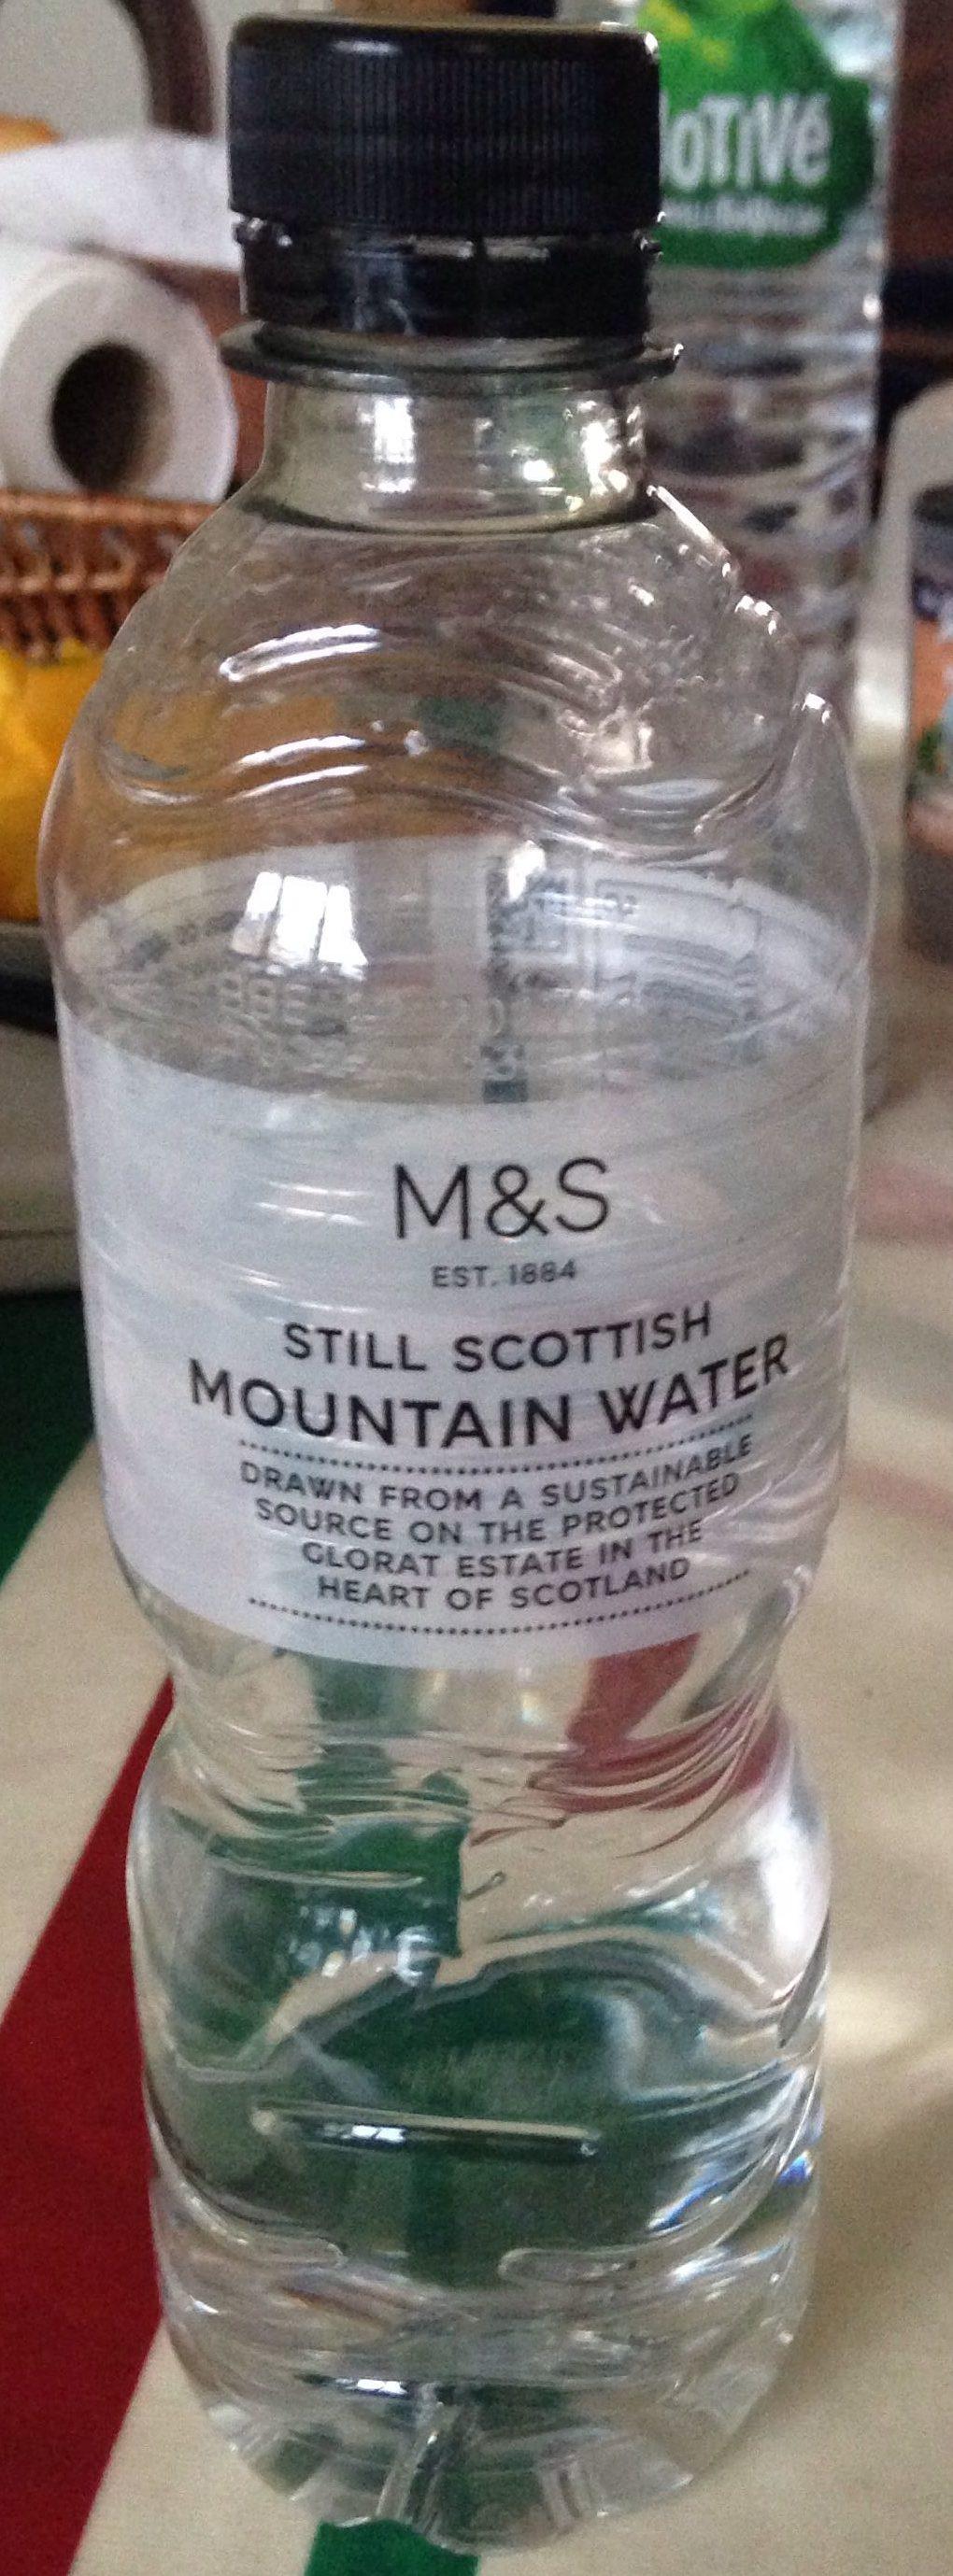 Still Scottish Mountain Water - Product - fr